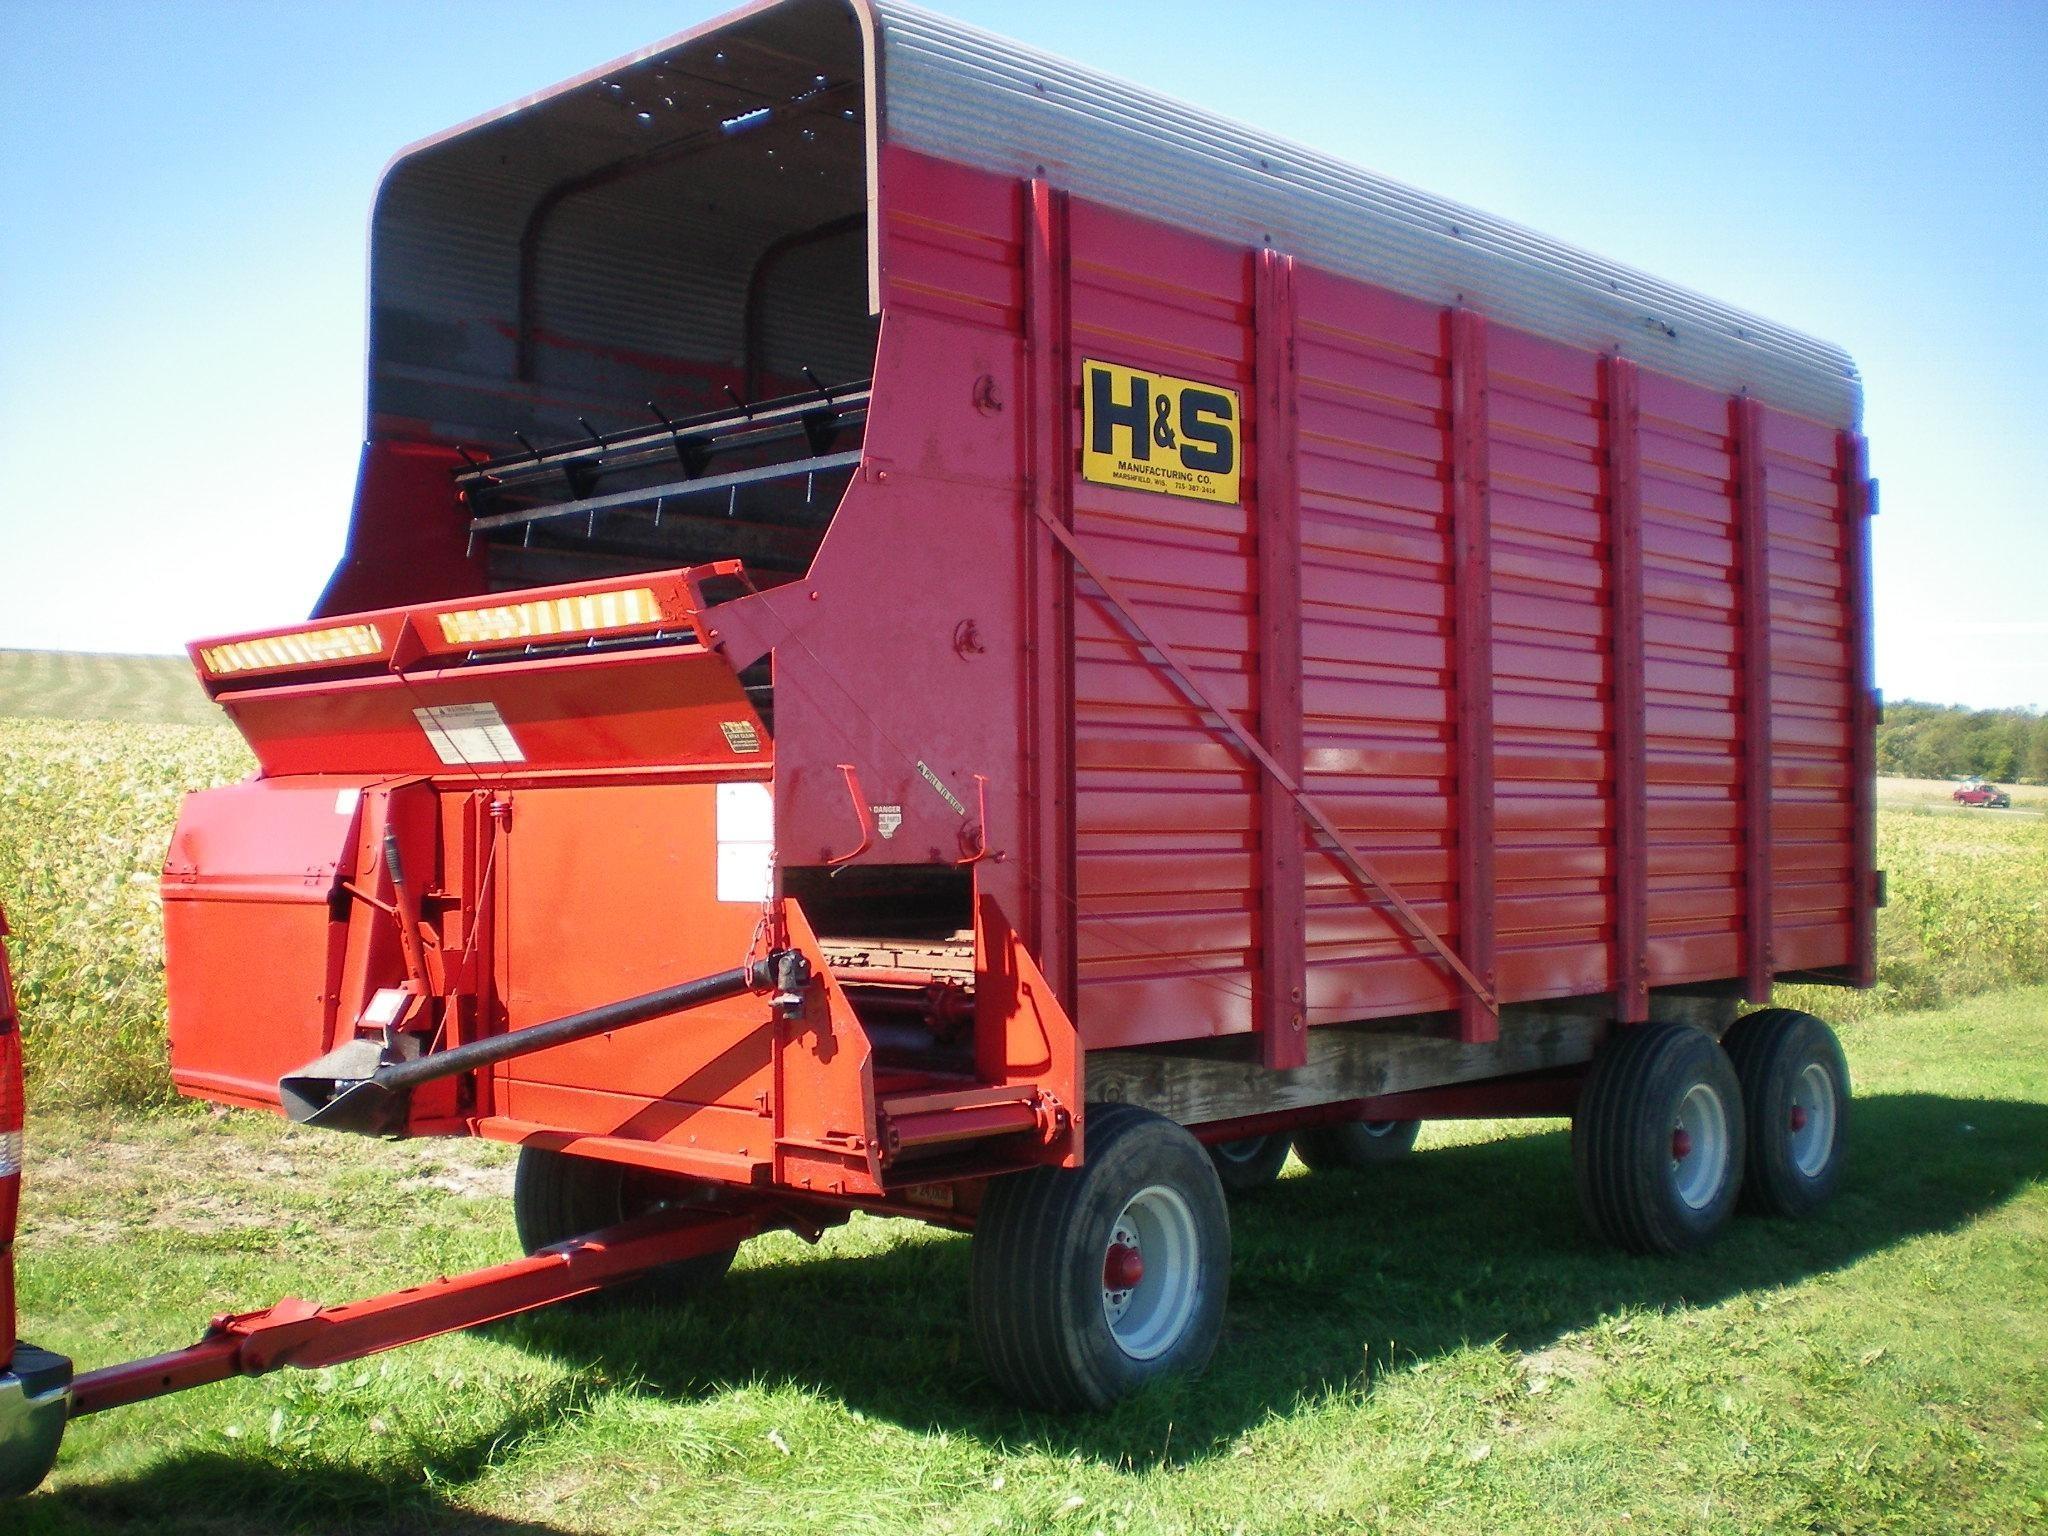 H & S 500 Forage Wagon